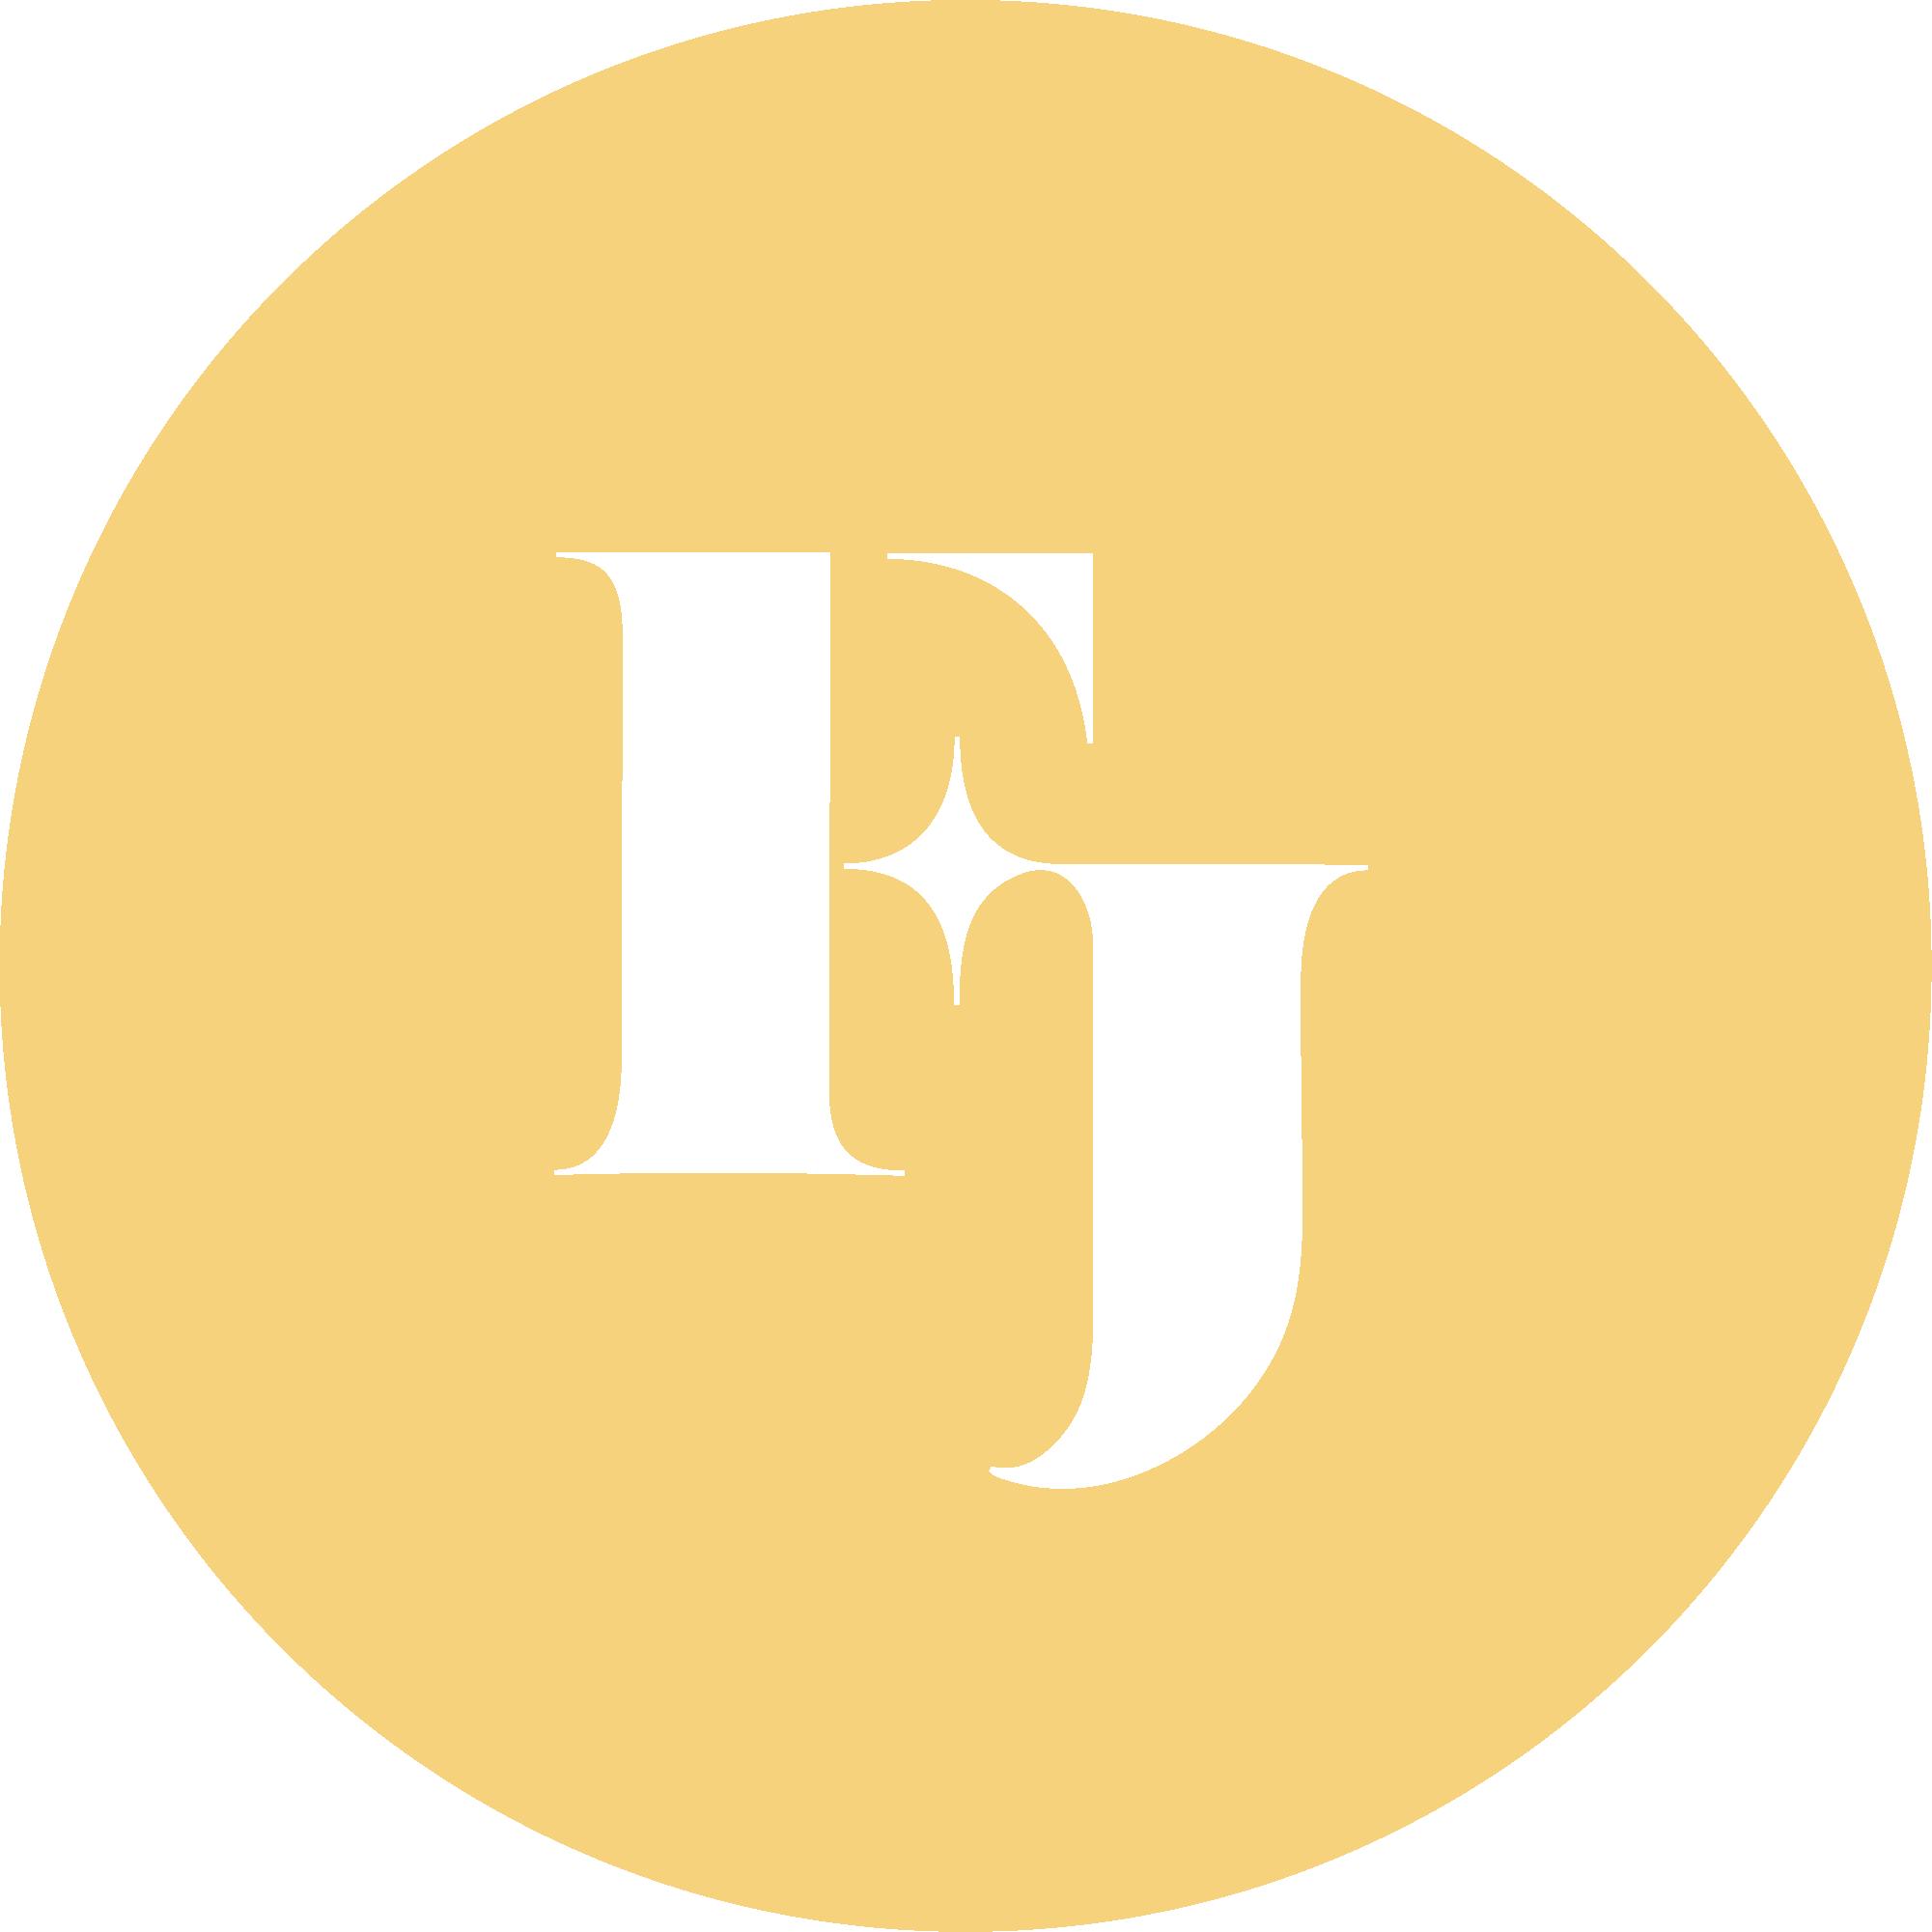 Circle FJ - Gold.png